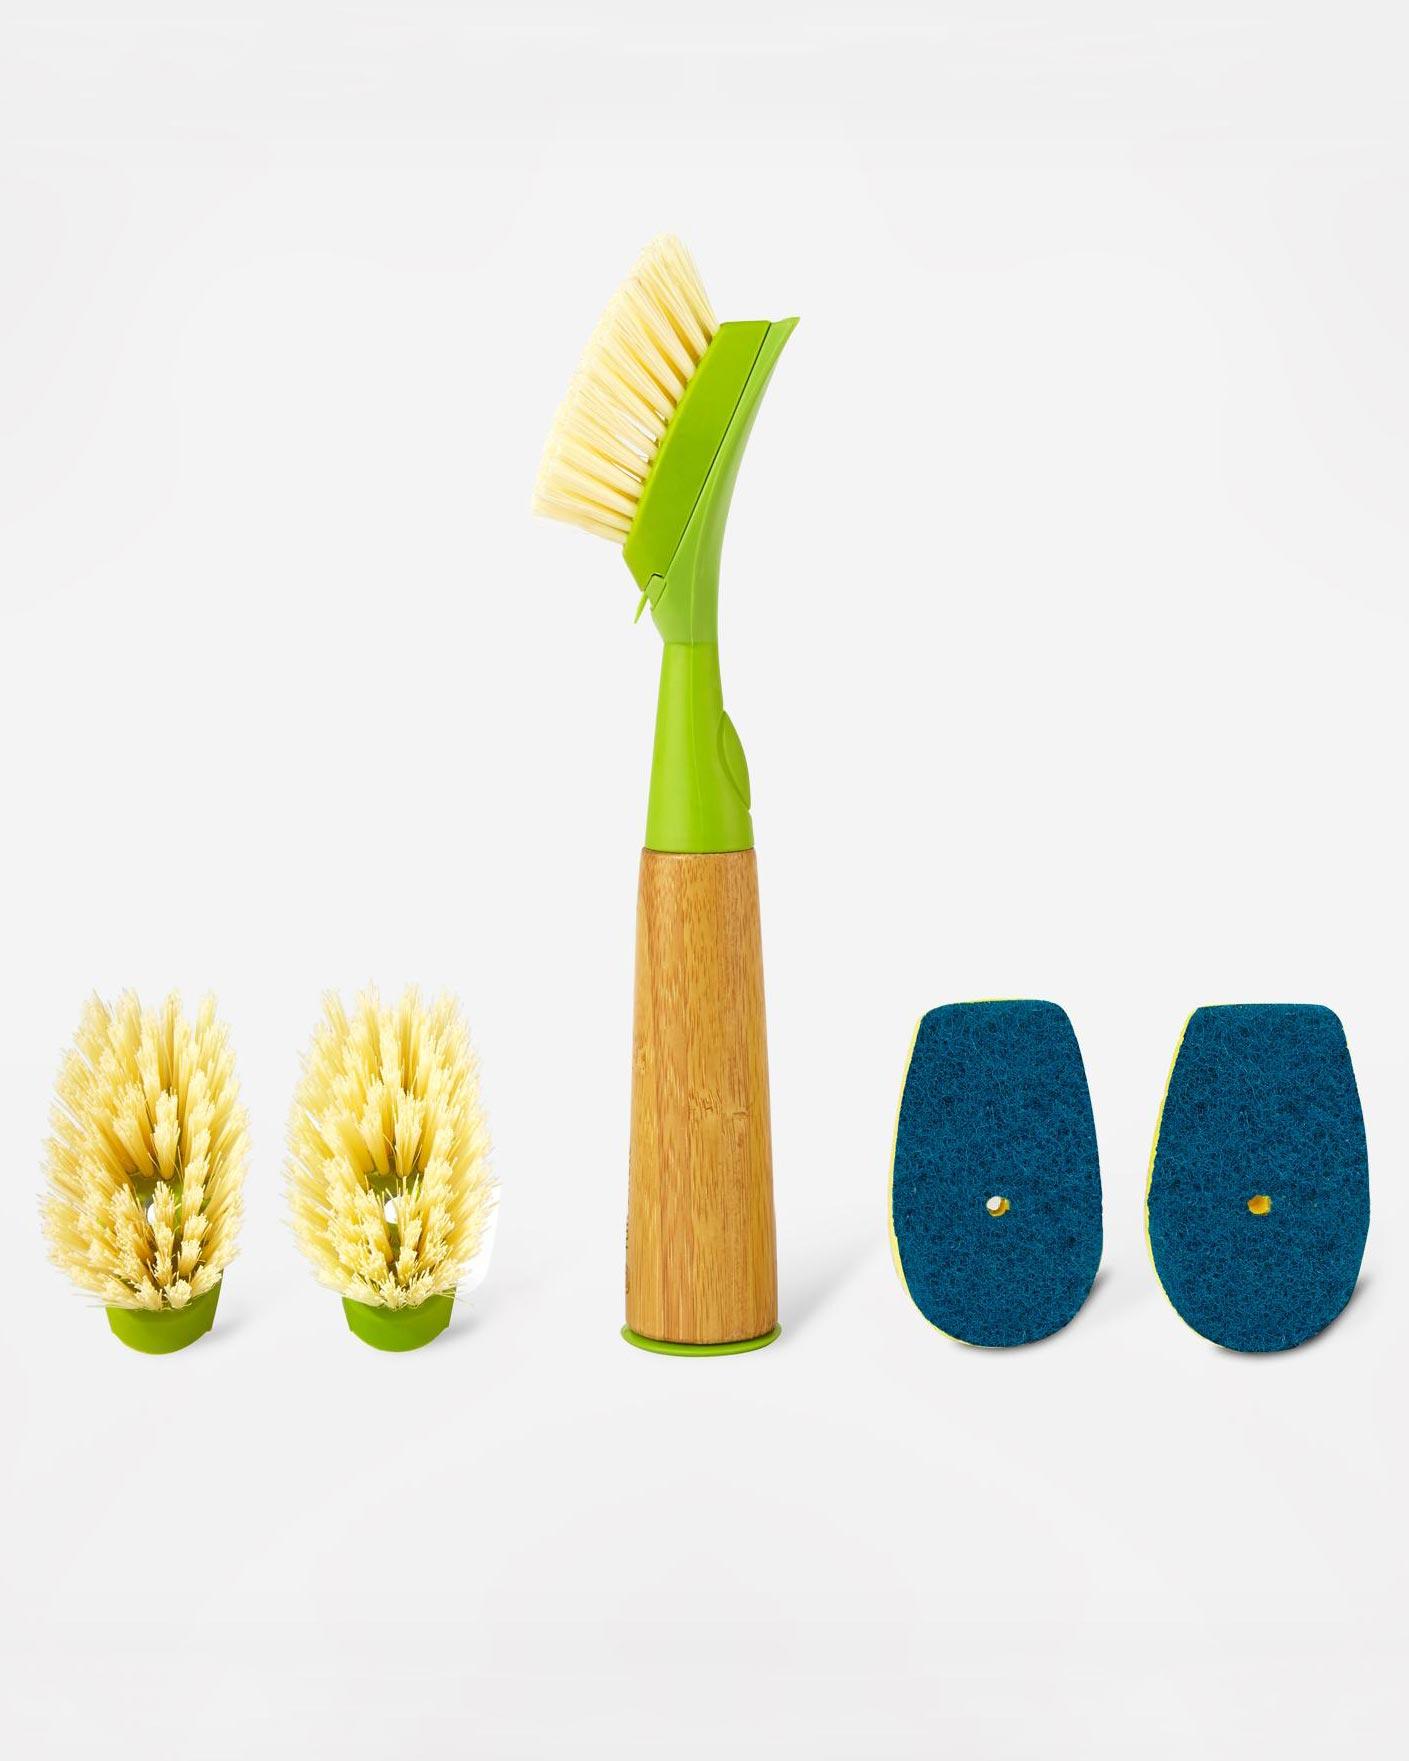 wedding gift reusable brush set